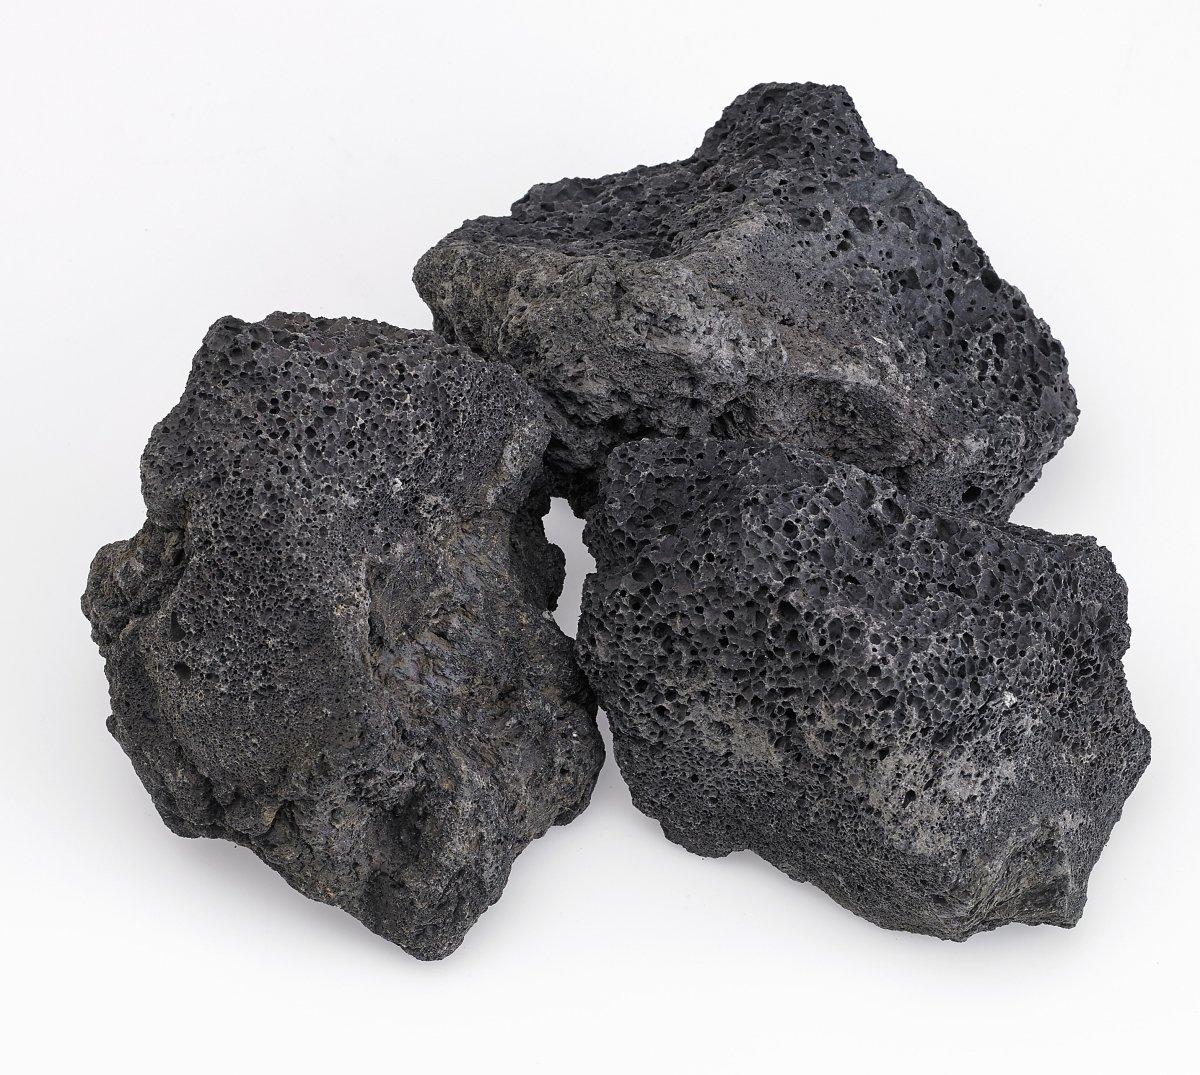 American Fire Glass XXL Black Lava Rock (4'' - 6'') 10 lb Bag 10 Pounds/Extra Large/Black